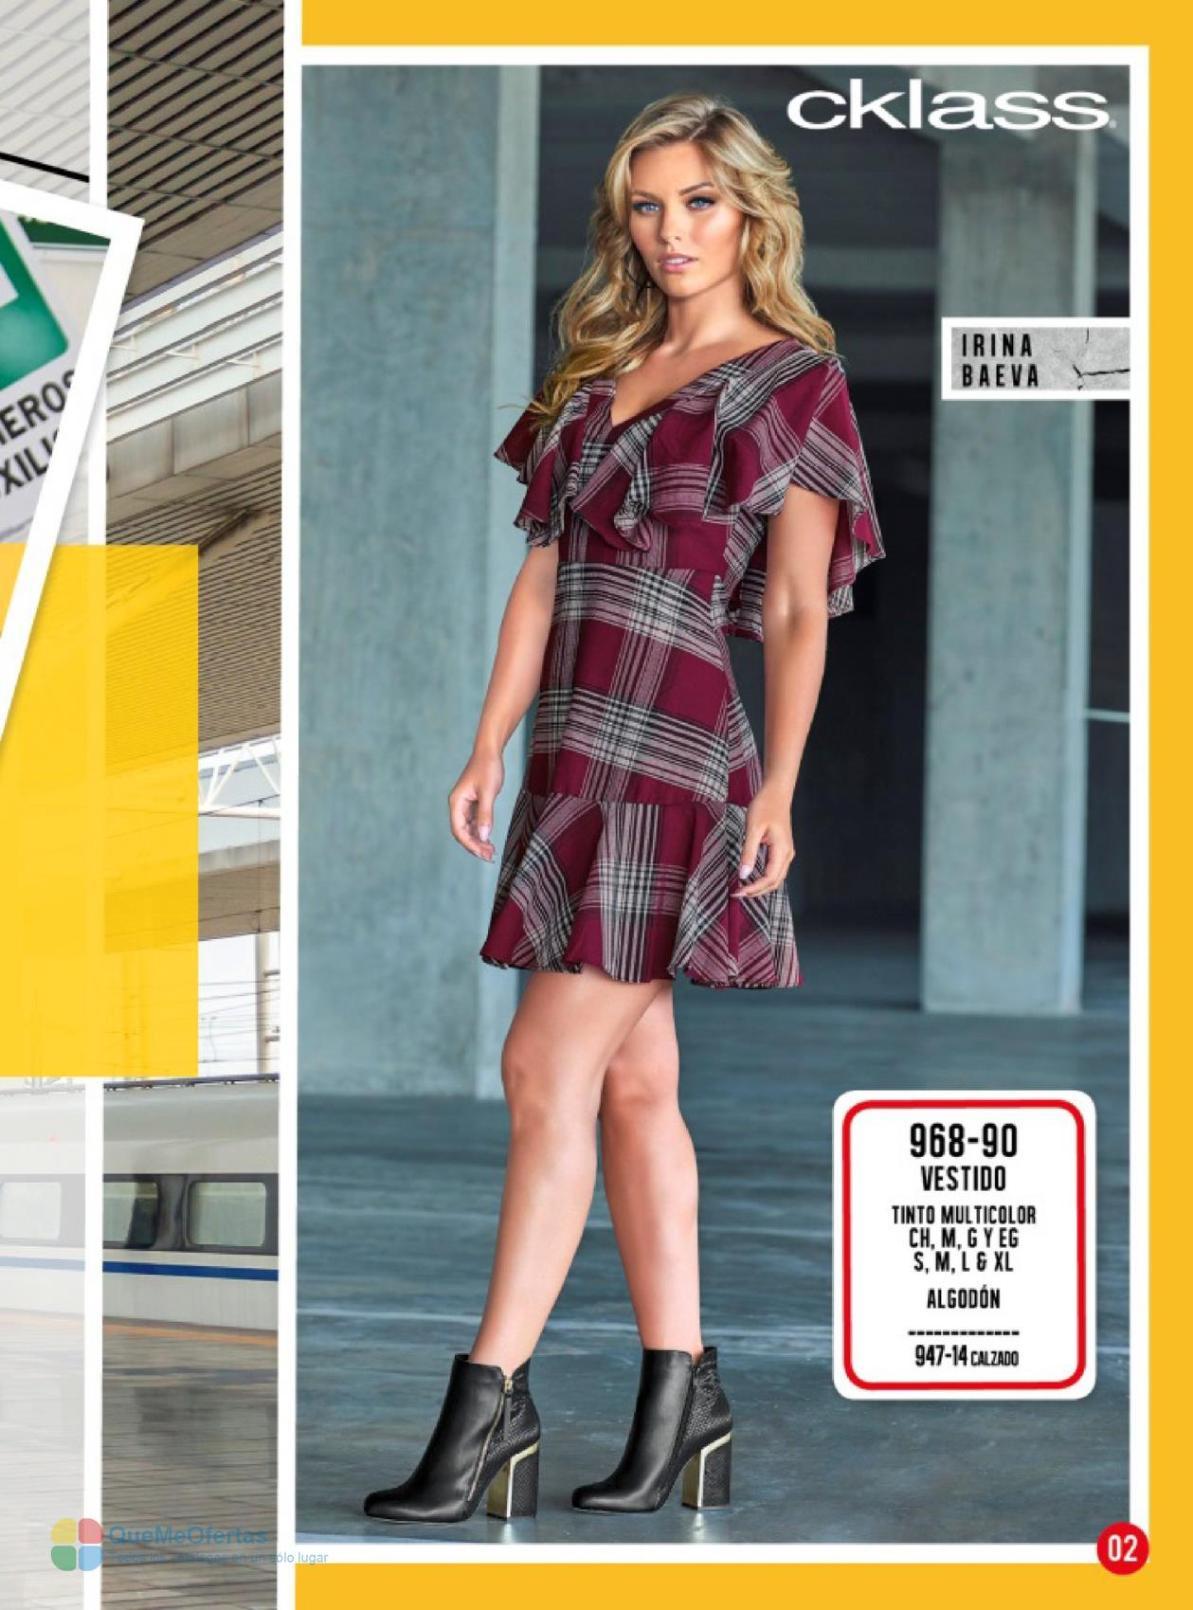 6f30db11f2 CKlass - 2019 03 10 - Catálogo CKlass - Ropa Dama - CALAMEO ...